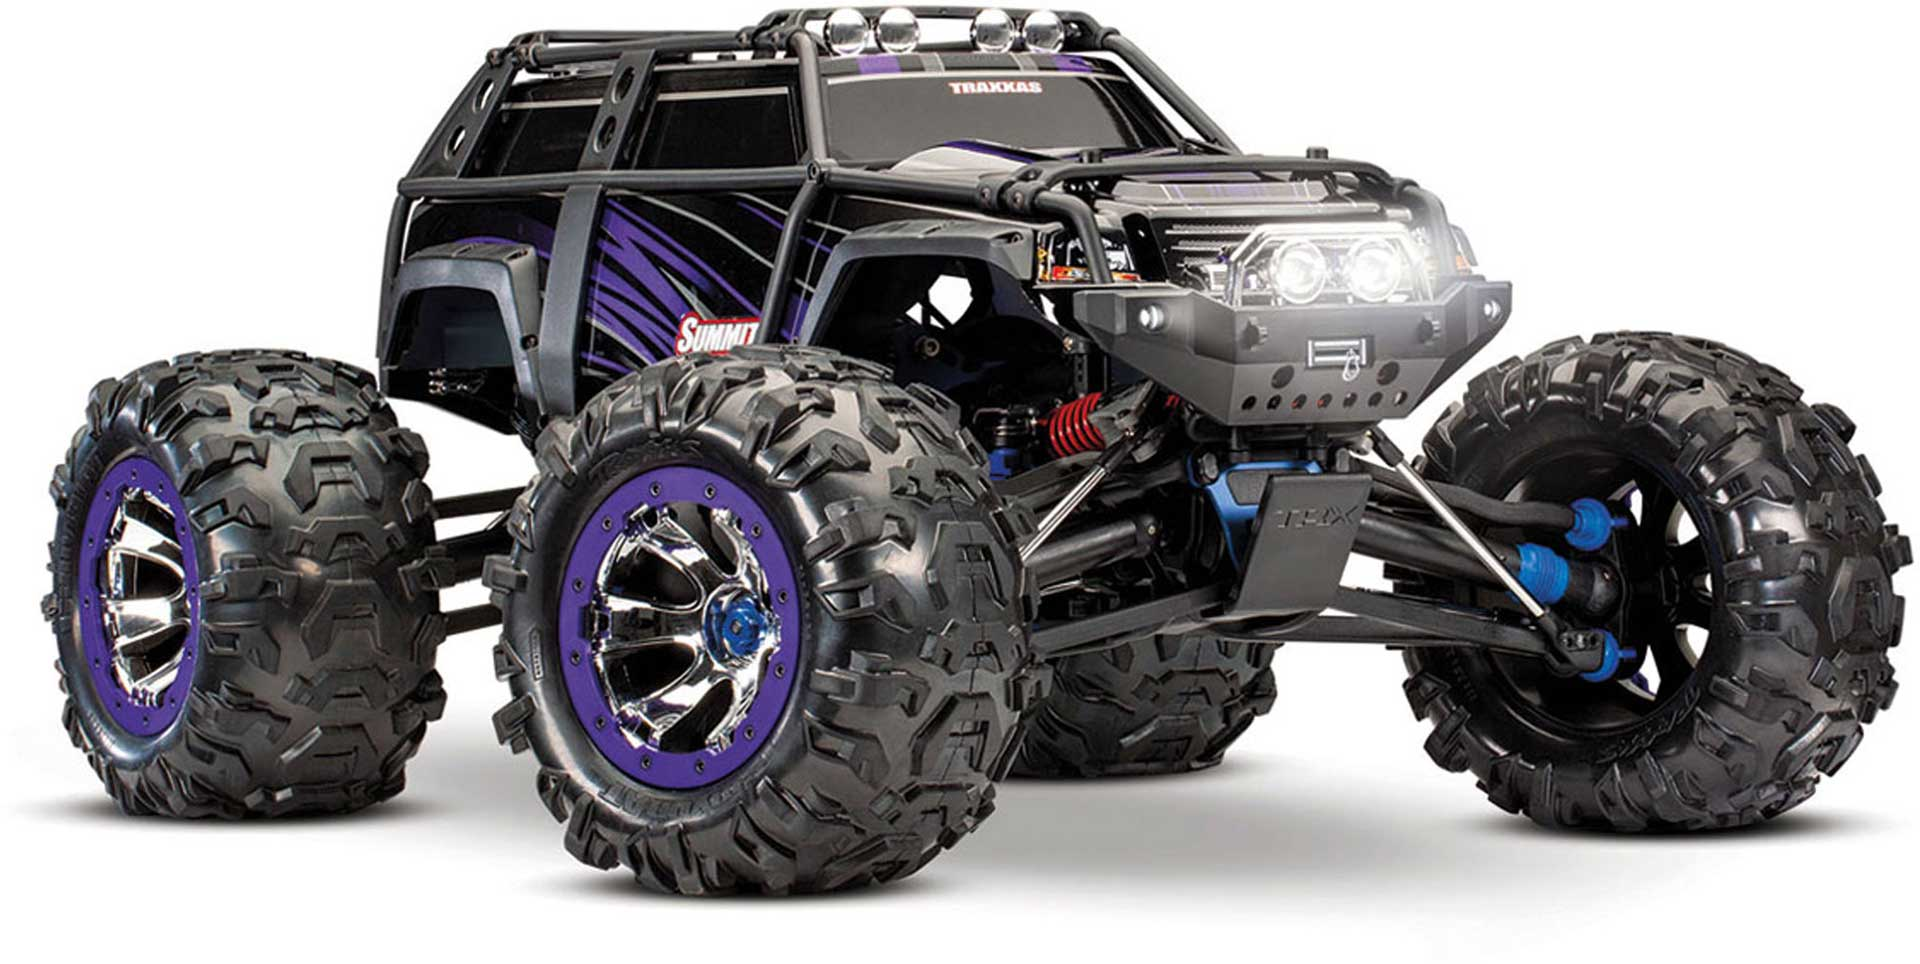 TRAXXAS SUMMIT PURPLE RTR EVX2 1/10 4WD EXTREME TERRAIN MONSTER TRUCK